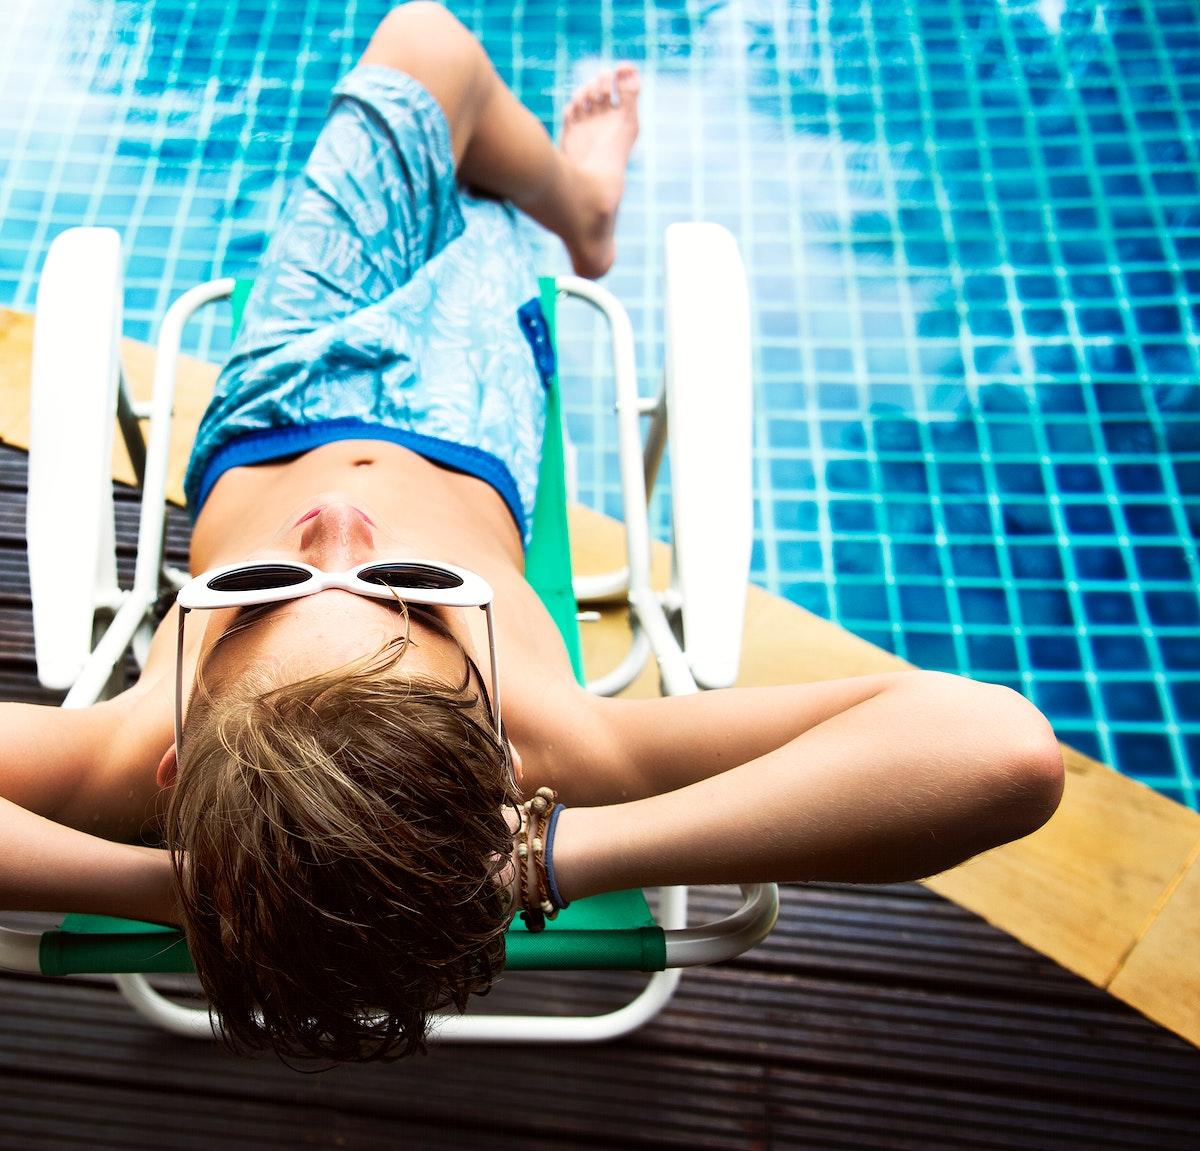 Young caucasian boy enjoying sunbathing by the pool